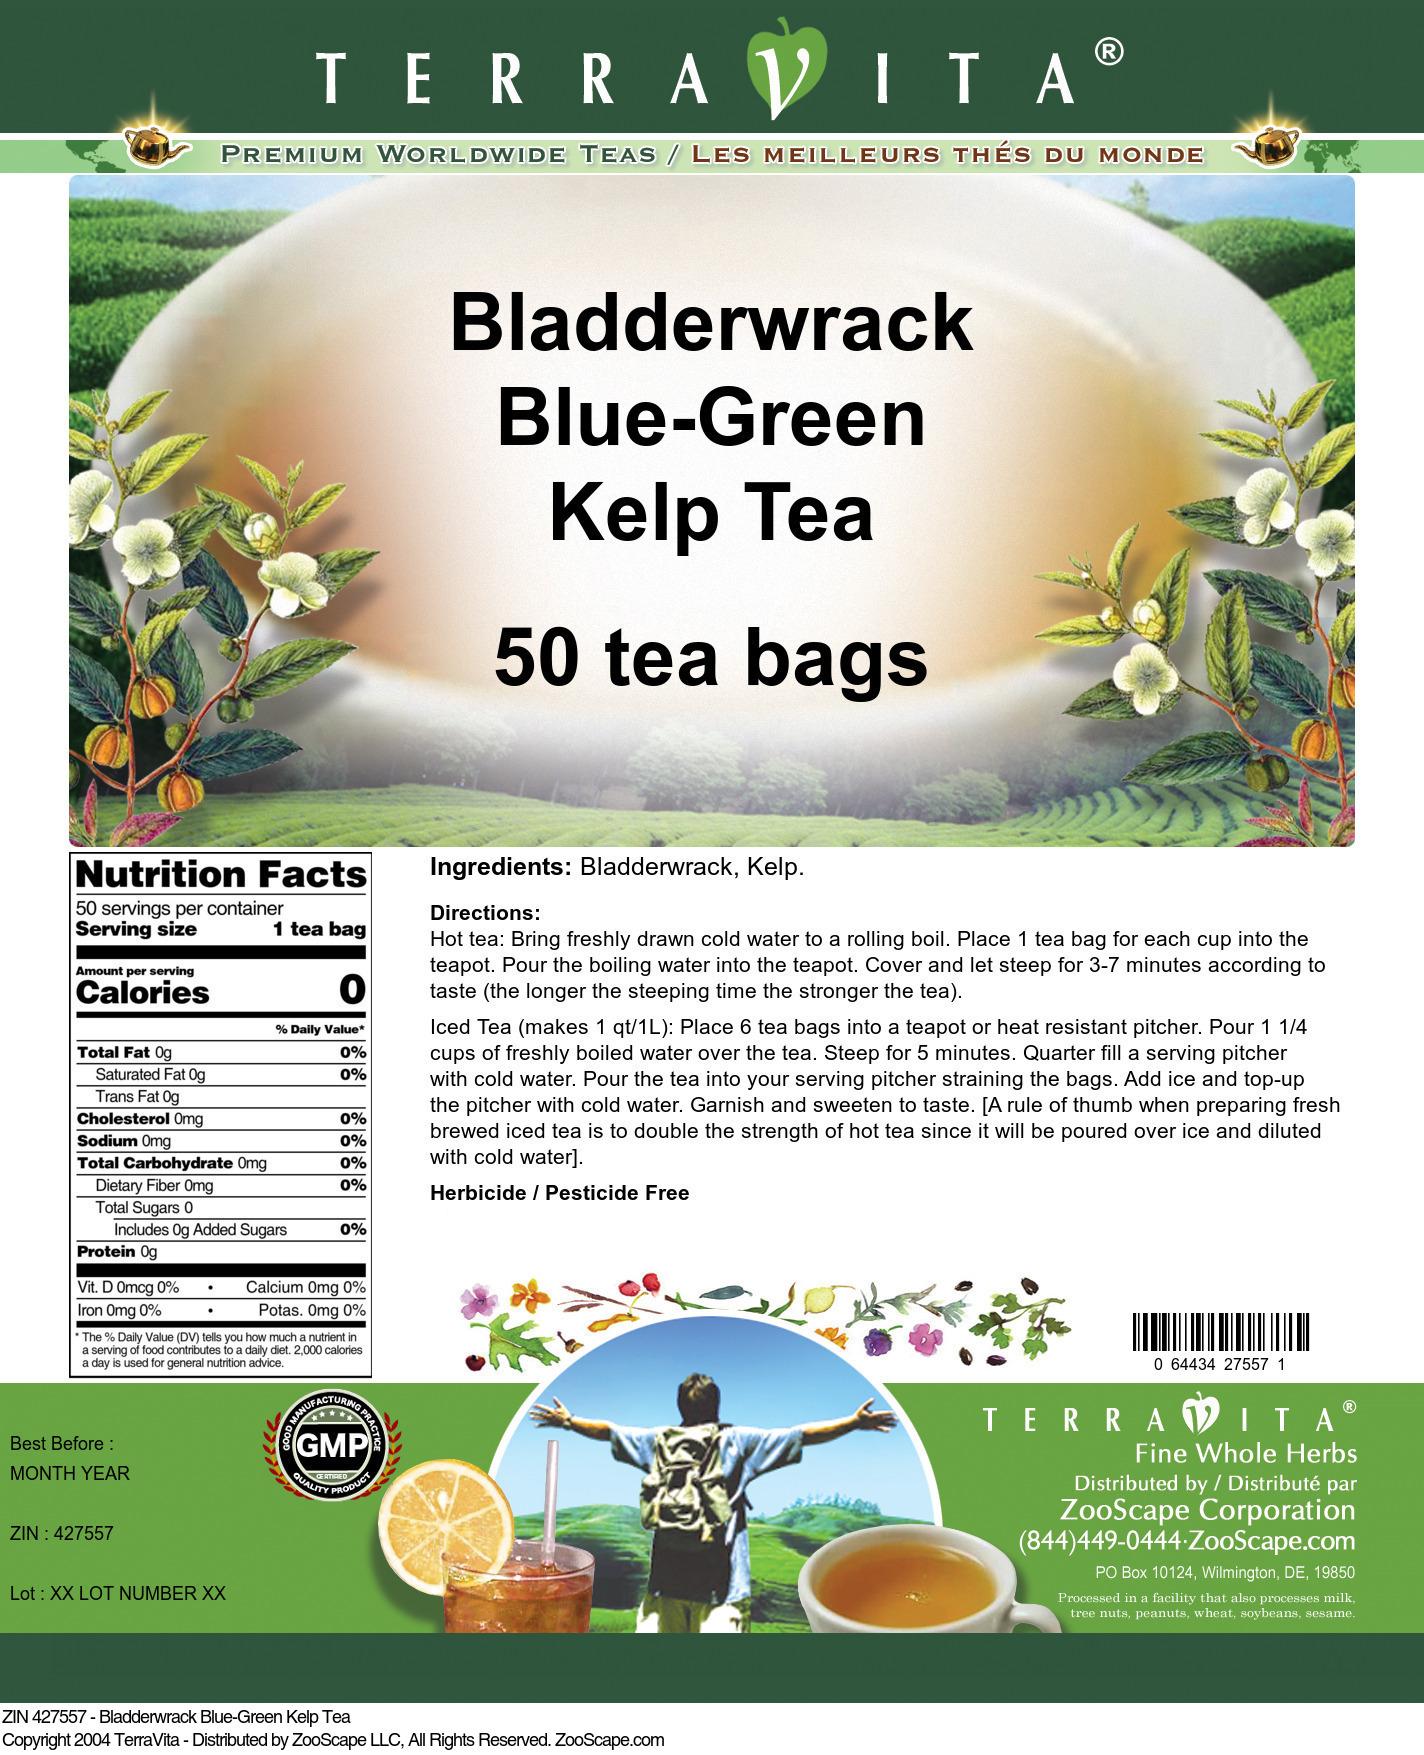 Bladderwrack Blue-Green Kelp Tea